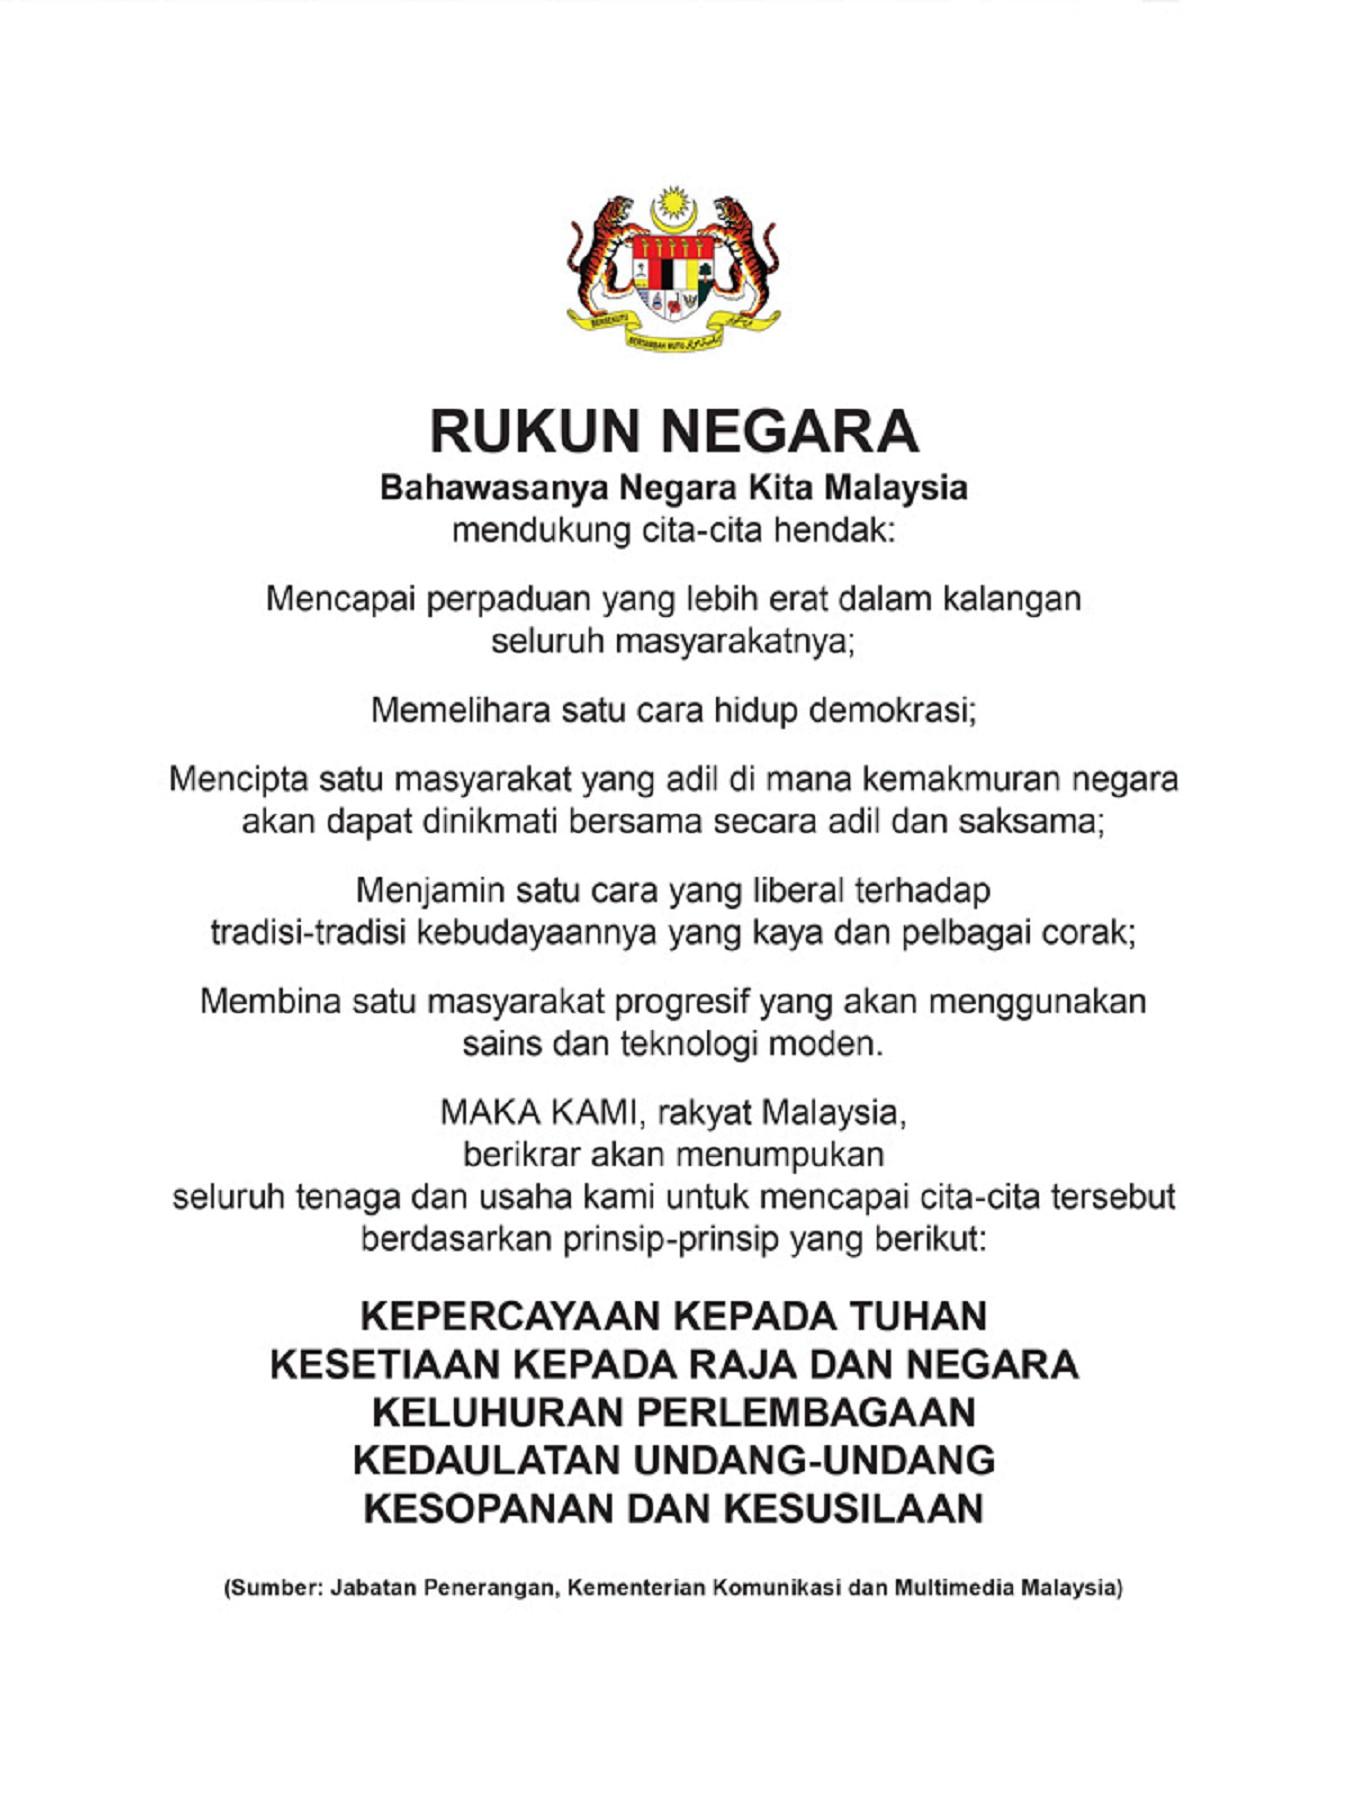 Buku Teks Bahasa Melayu Tahun 5 Membalik Buku Halaman 1 50 Pubhtml5